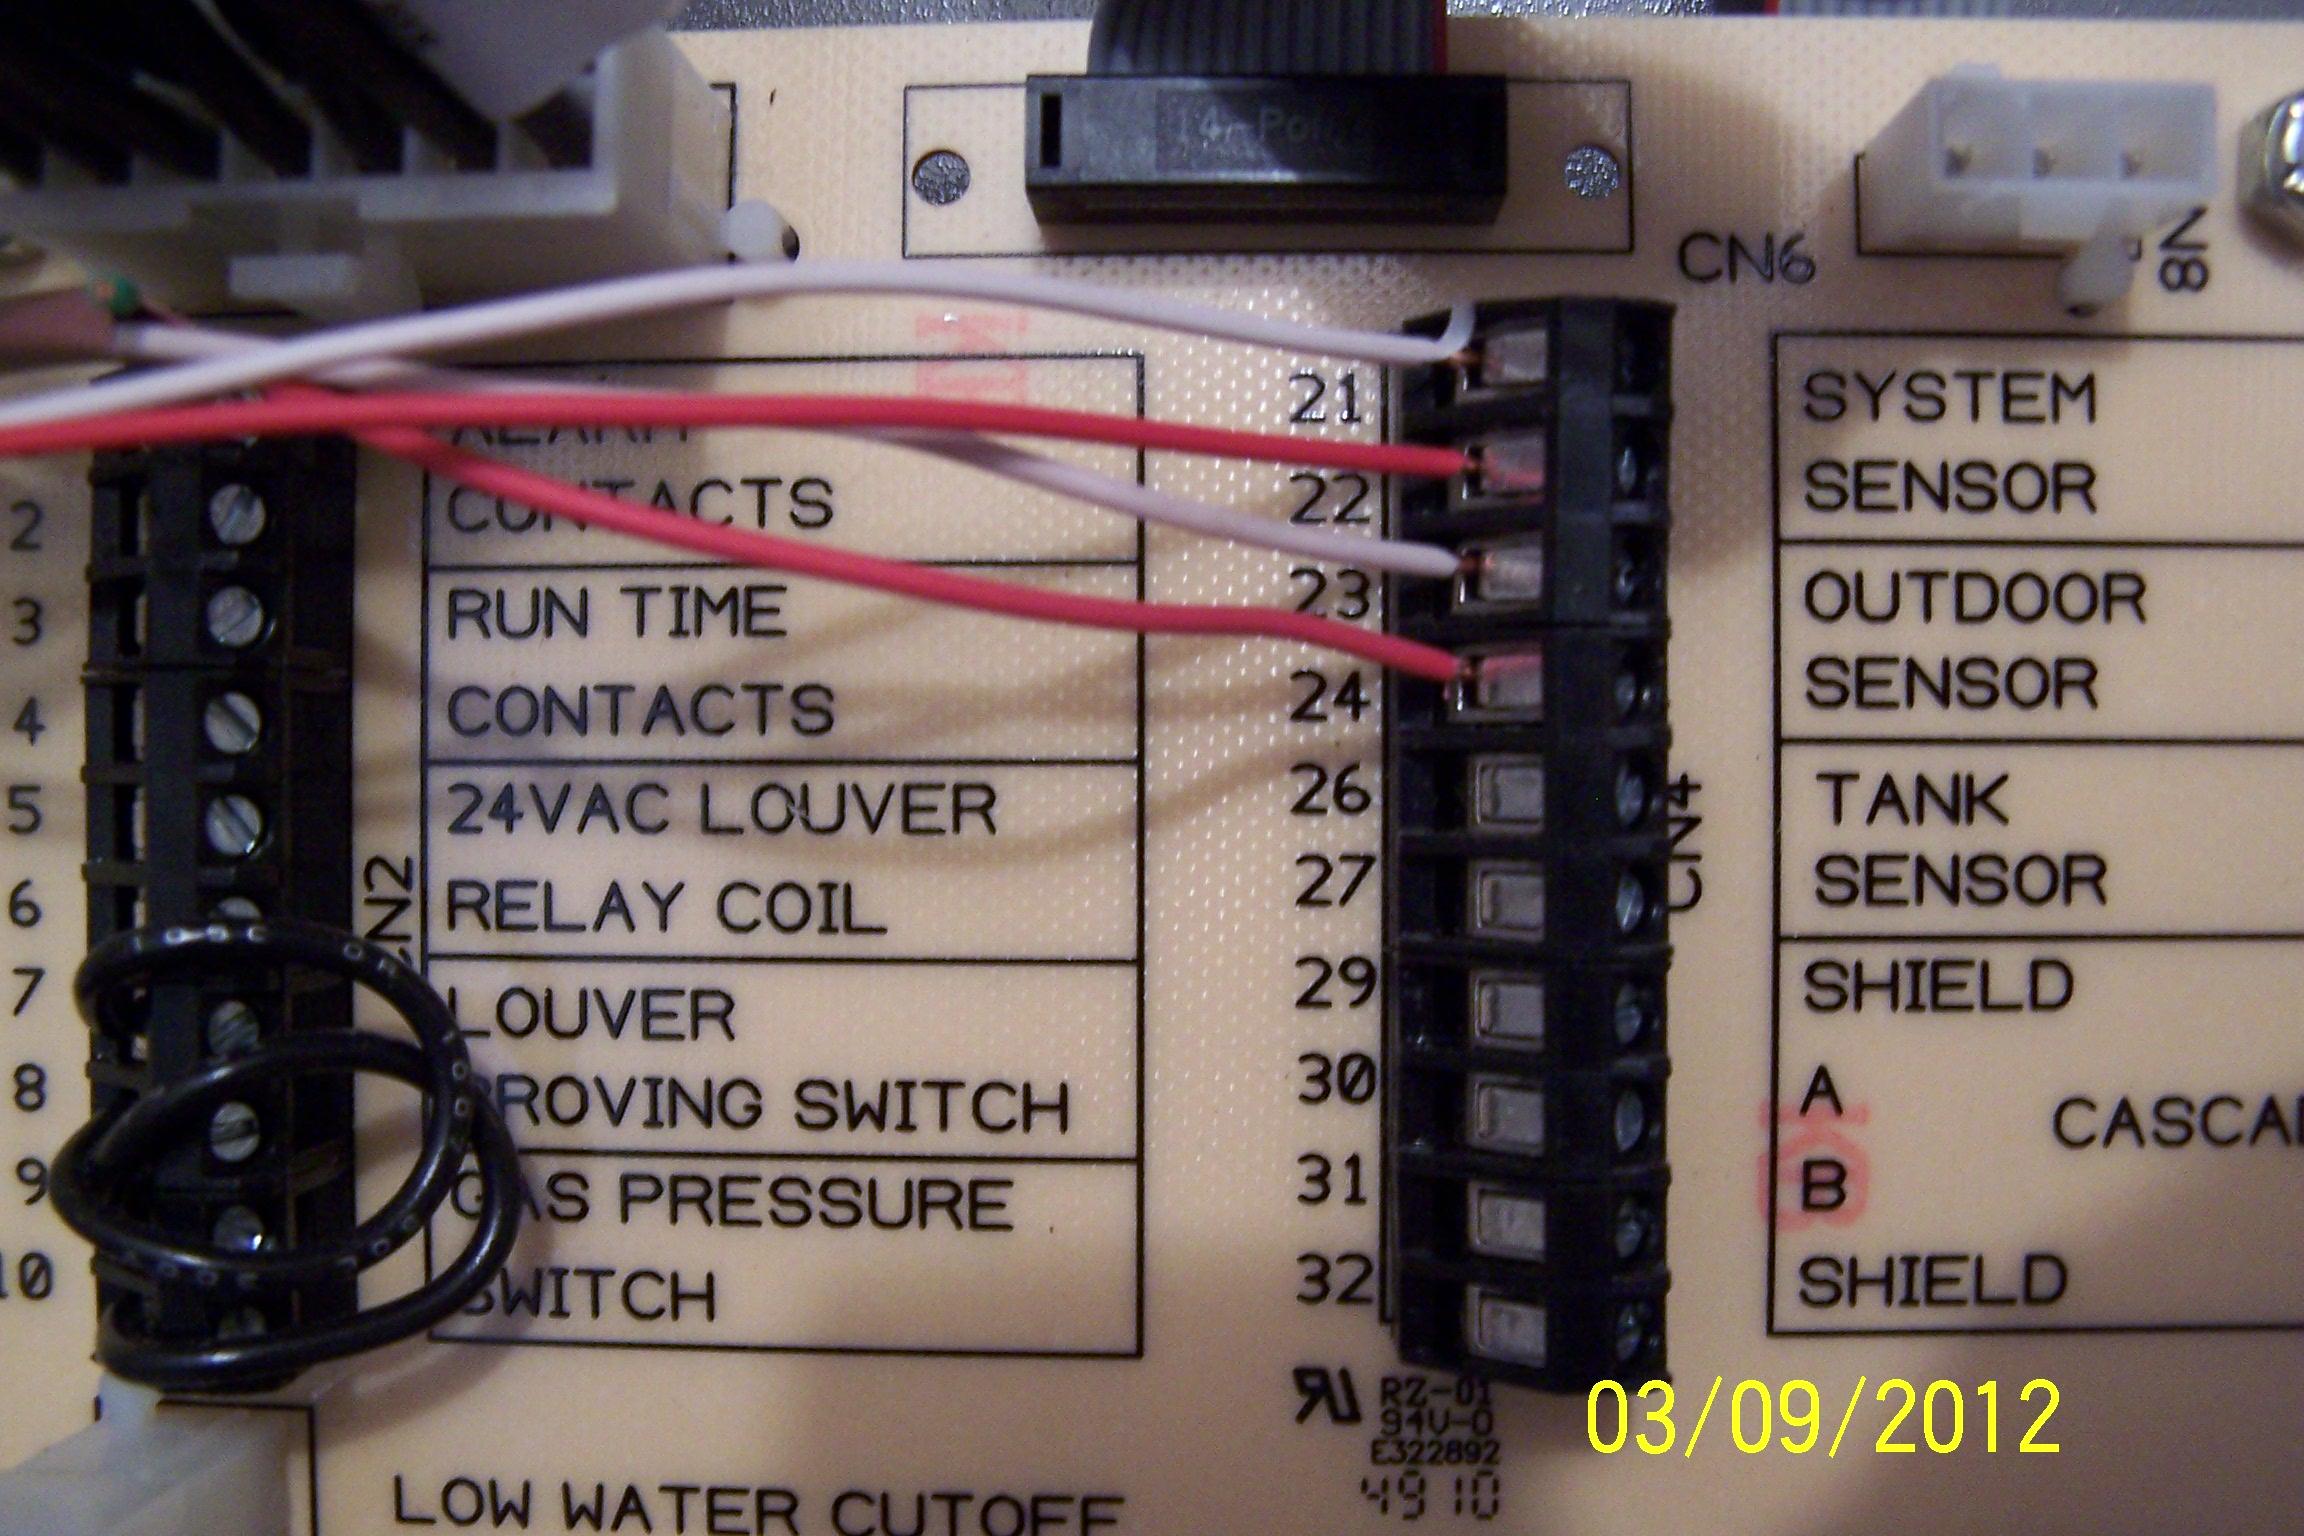 Amtrol Smart Control Wiring Diagram Schematic Diagrams For Boilermate 43